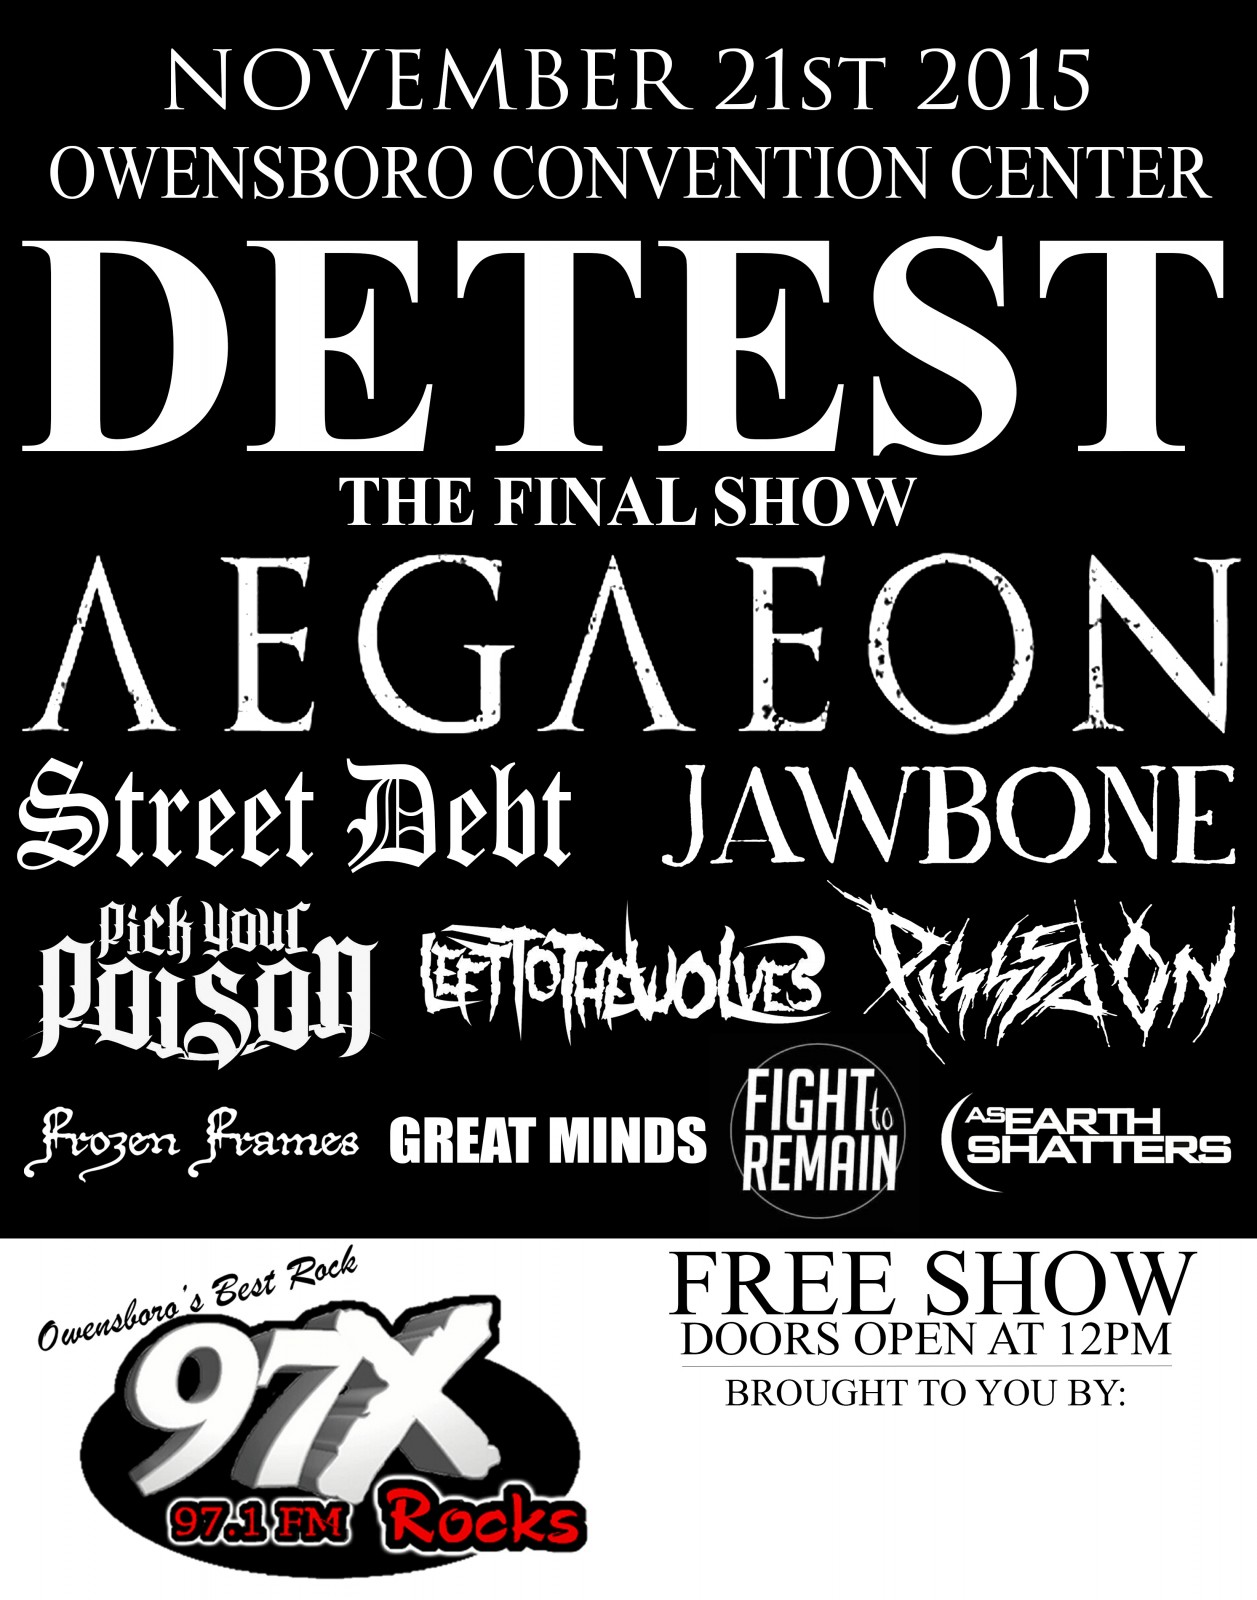 Metal Festival Coming To Owensboro Convention Center Nov. 21st!